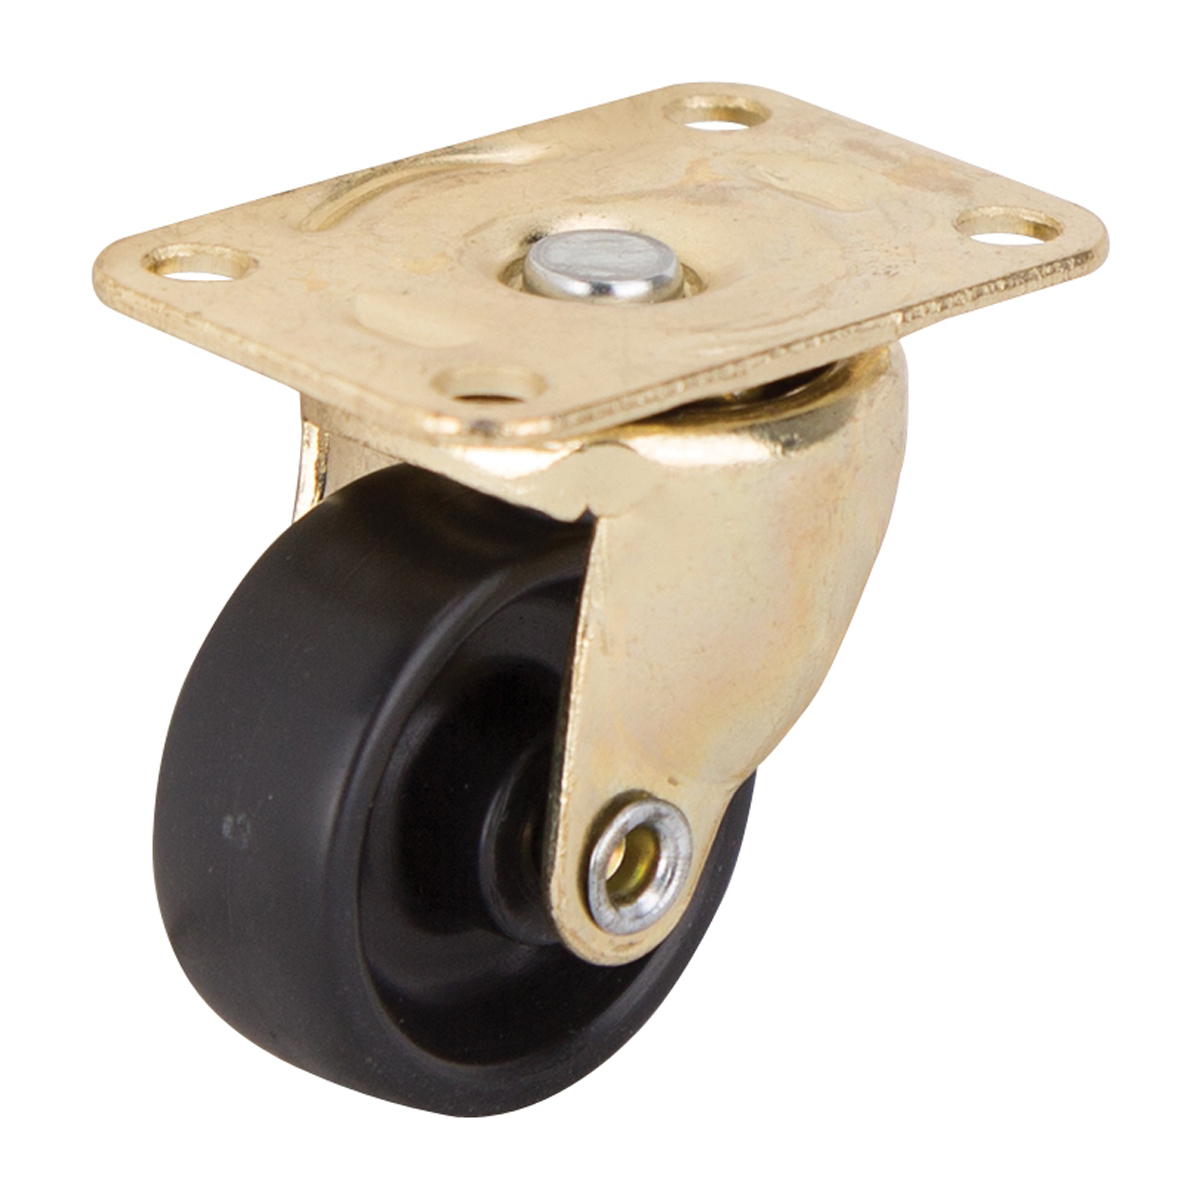 Picture of ProSource JC-B02-PS Swivel Caster, 1-1/4 in Dia Wheel, Hard Plastic Wheel, Black, 40 lb